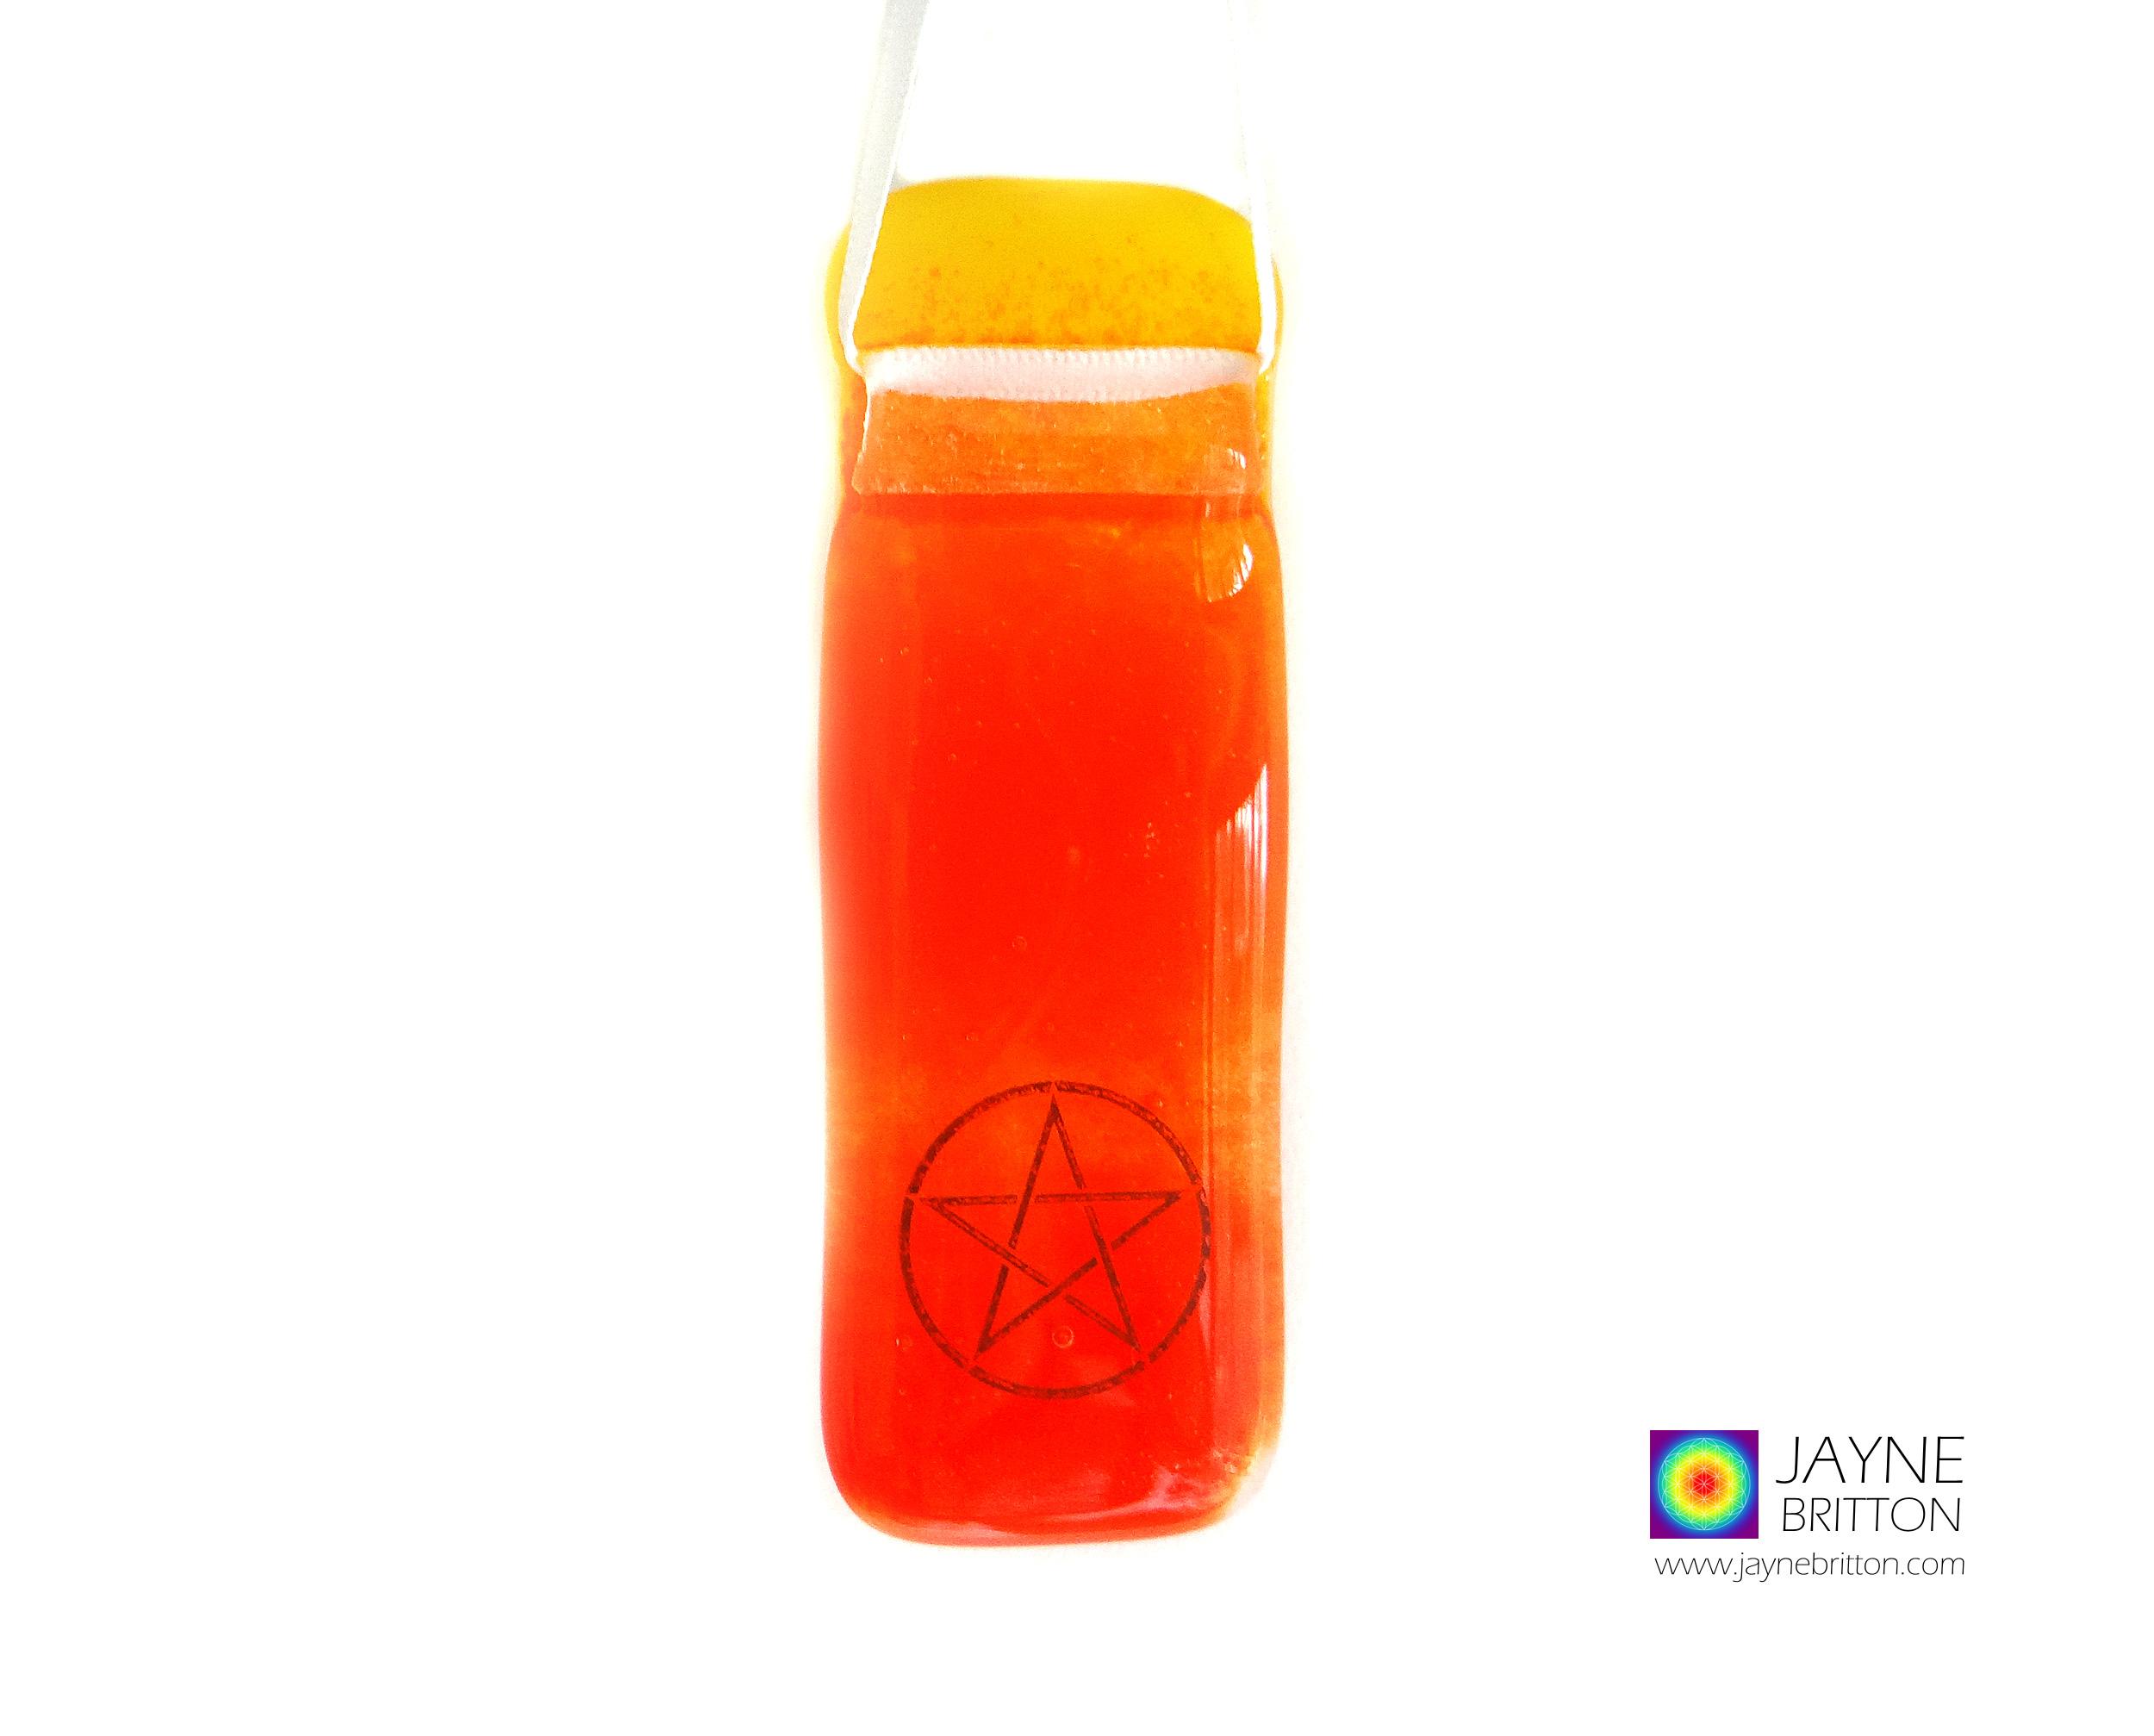 Pentacle light catcher, fused glass suncatcher, symbol, symbolic, healing, meditation, window hanging, witchcraft, wicca, magical symbol